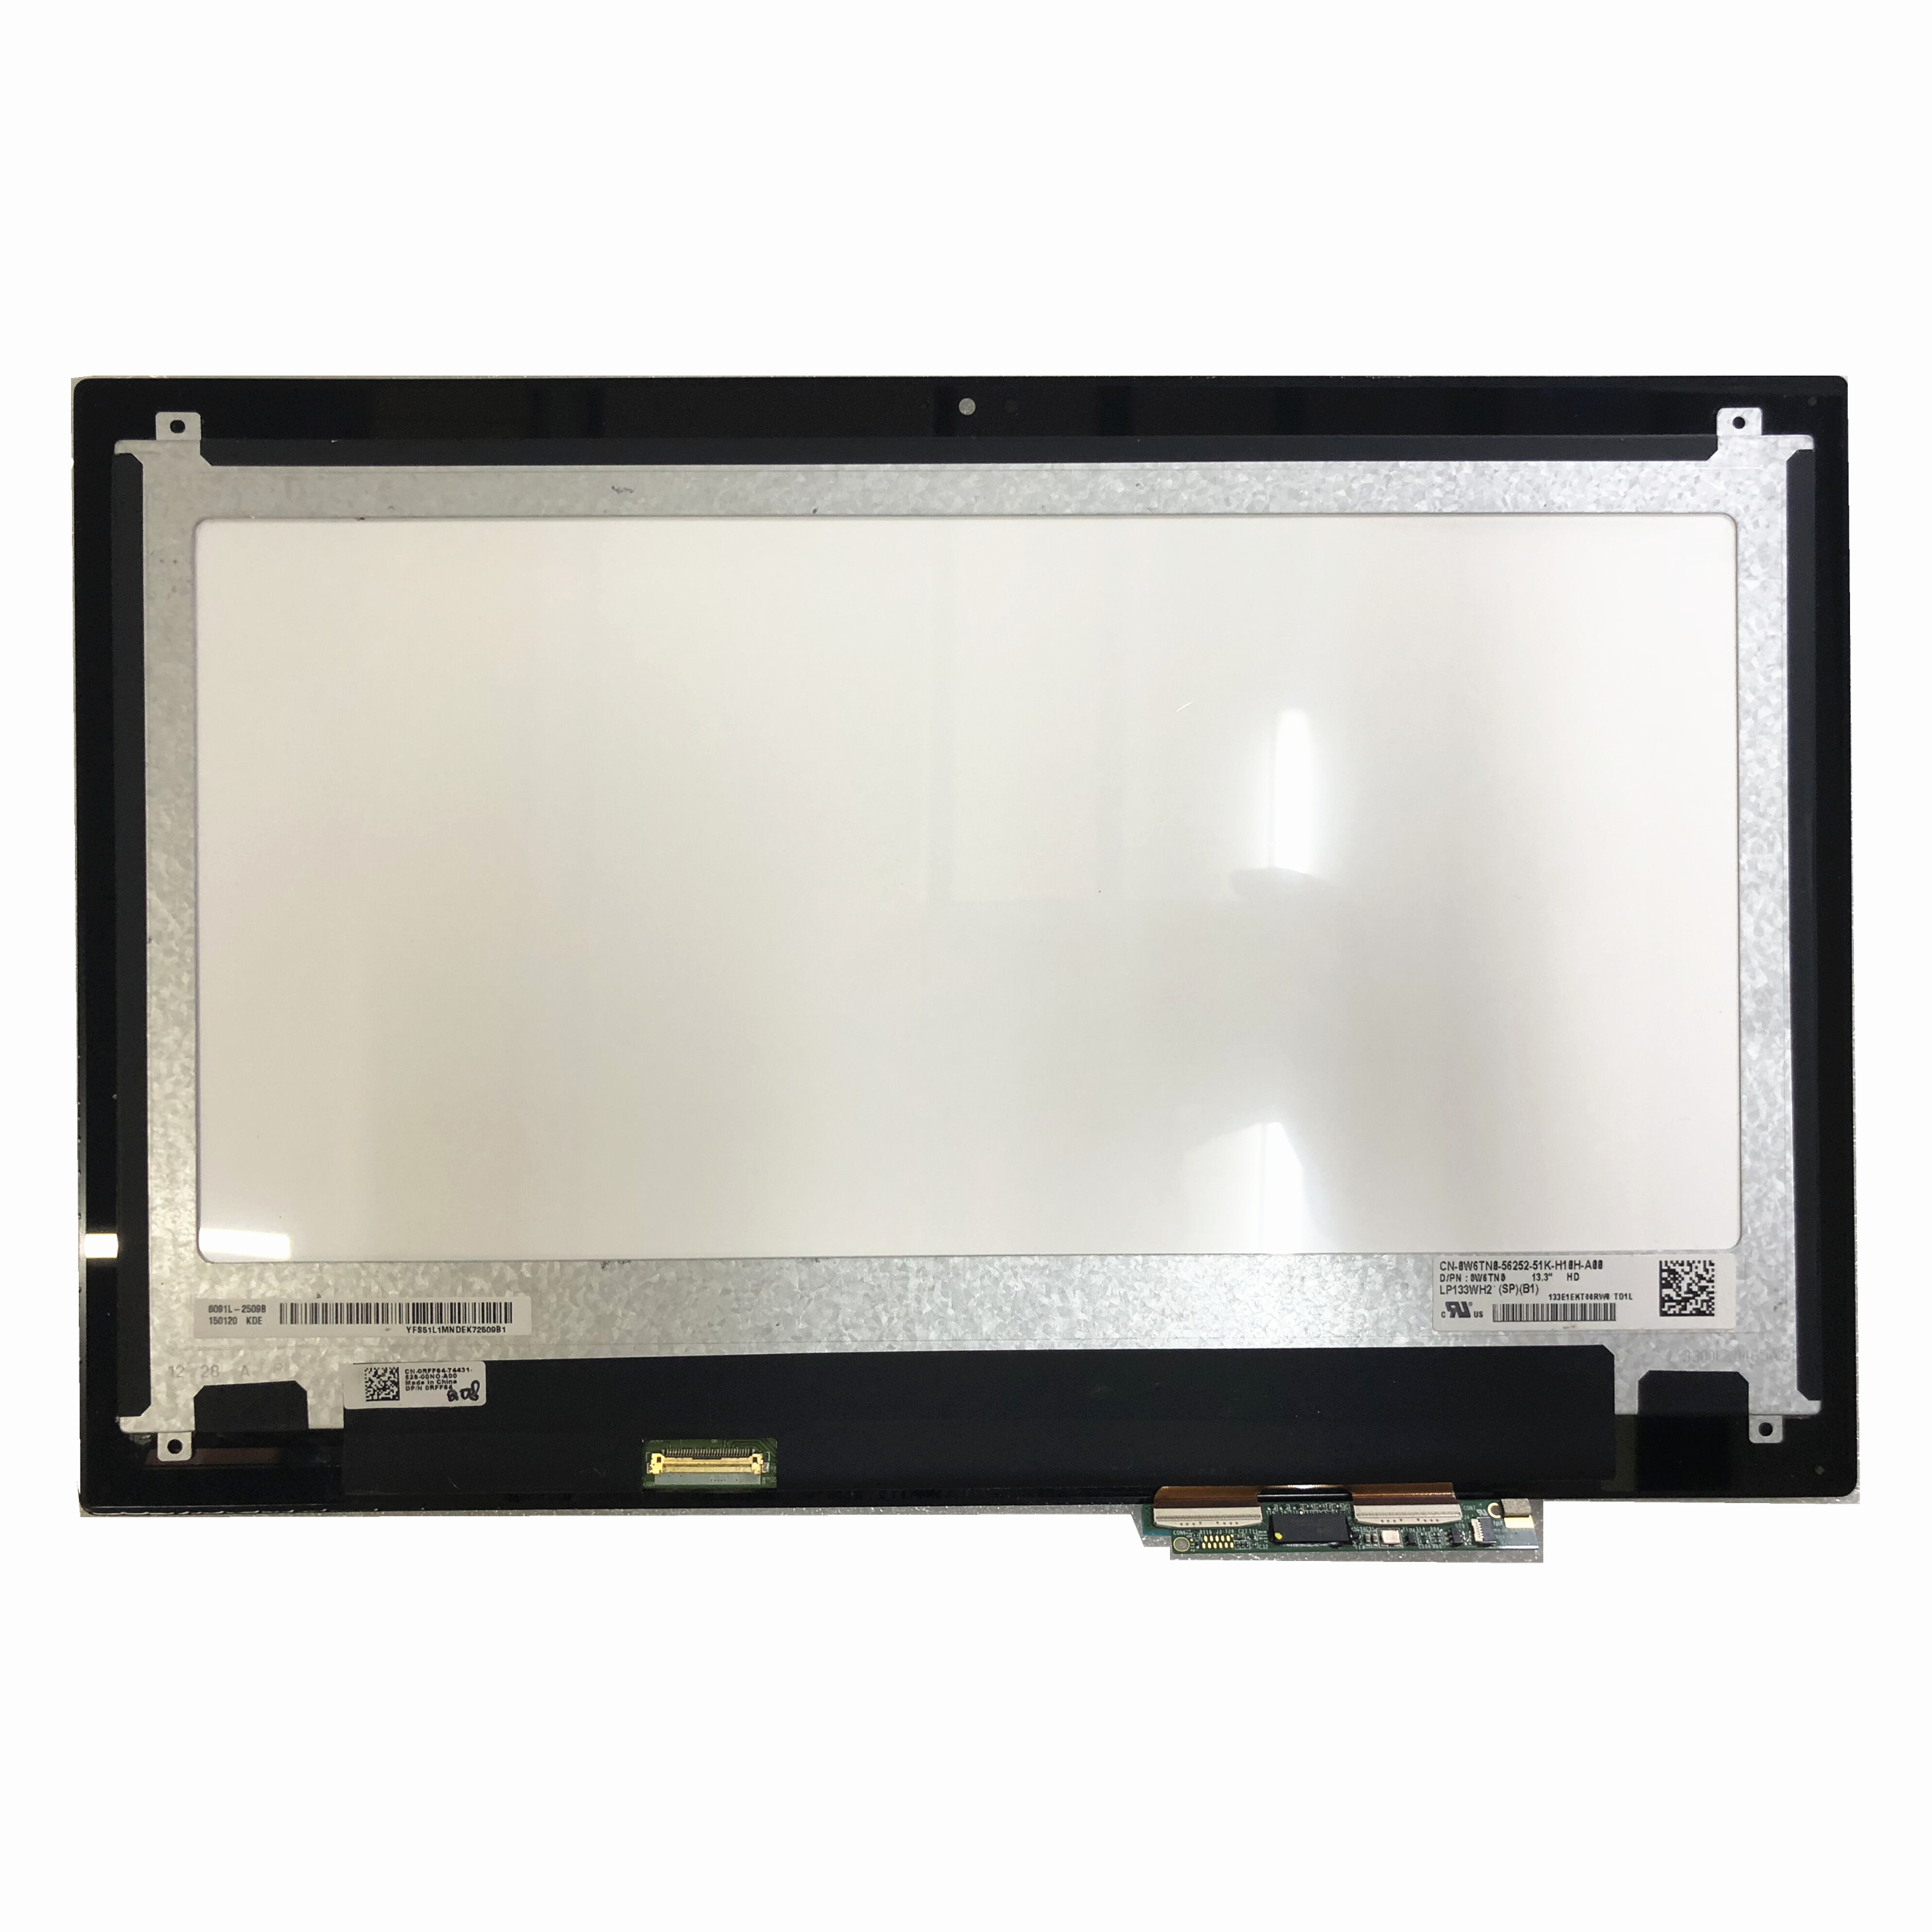 13,3 ''ноутбук ЖК экран сенсорный дигитайзер сборка LP133WH2 SPB1 для Dell Inspiron 13 7000 7347 D/PN: 0W6TN0